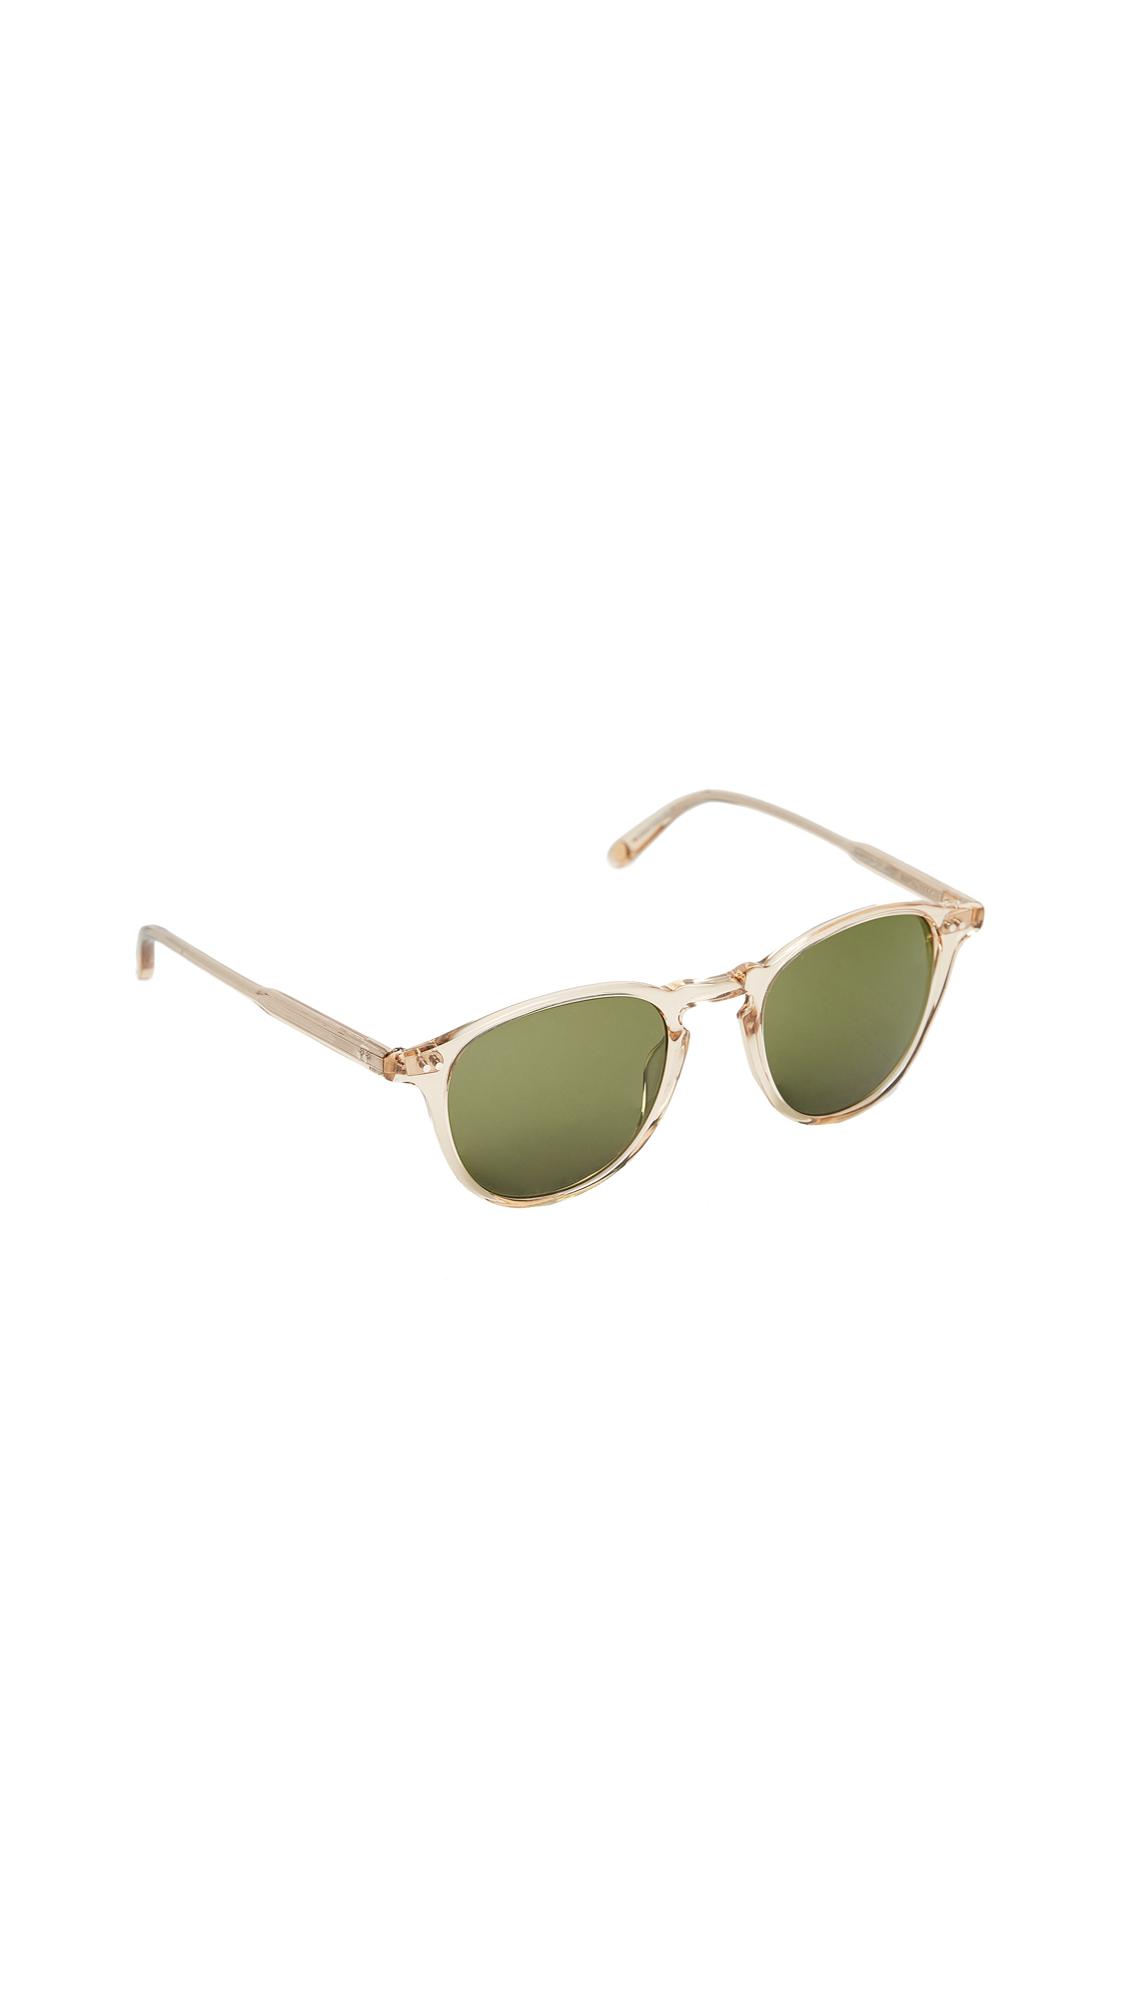 GARRETT LEIGHT Hampton Sunglasses - Champagne/Pure Green